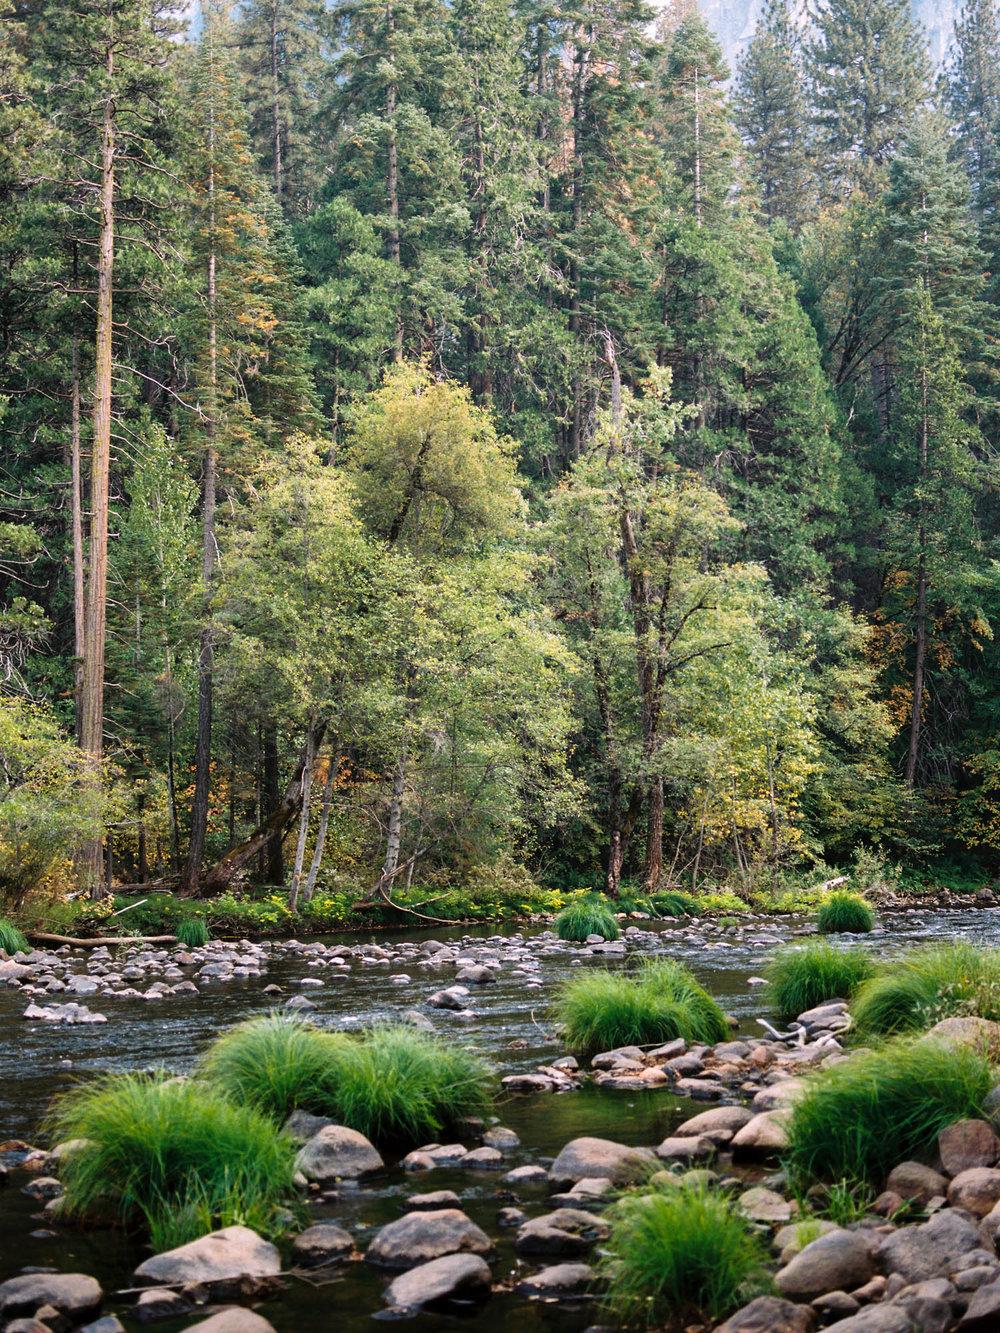 yosemite national park merced river yosemite valley photography on film.jpg